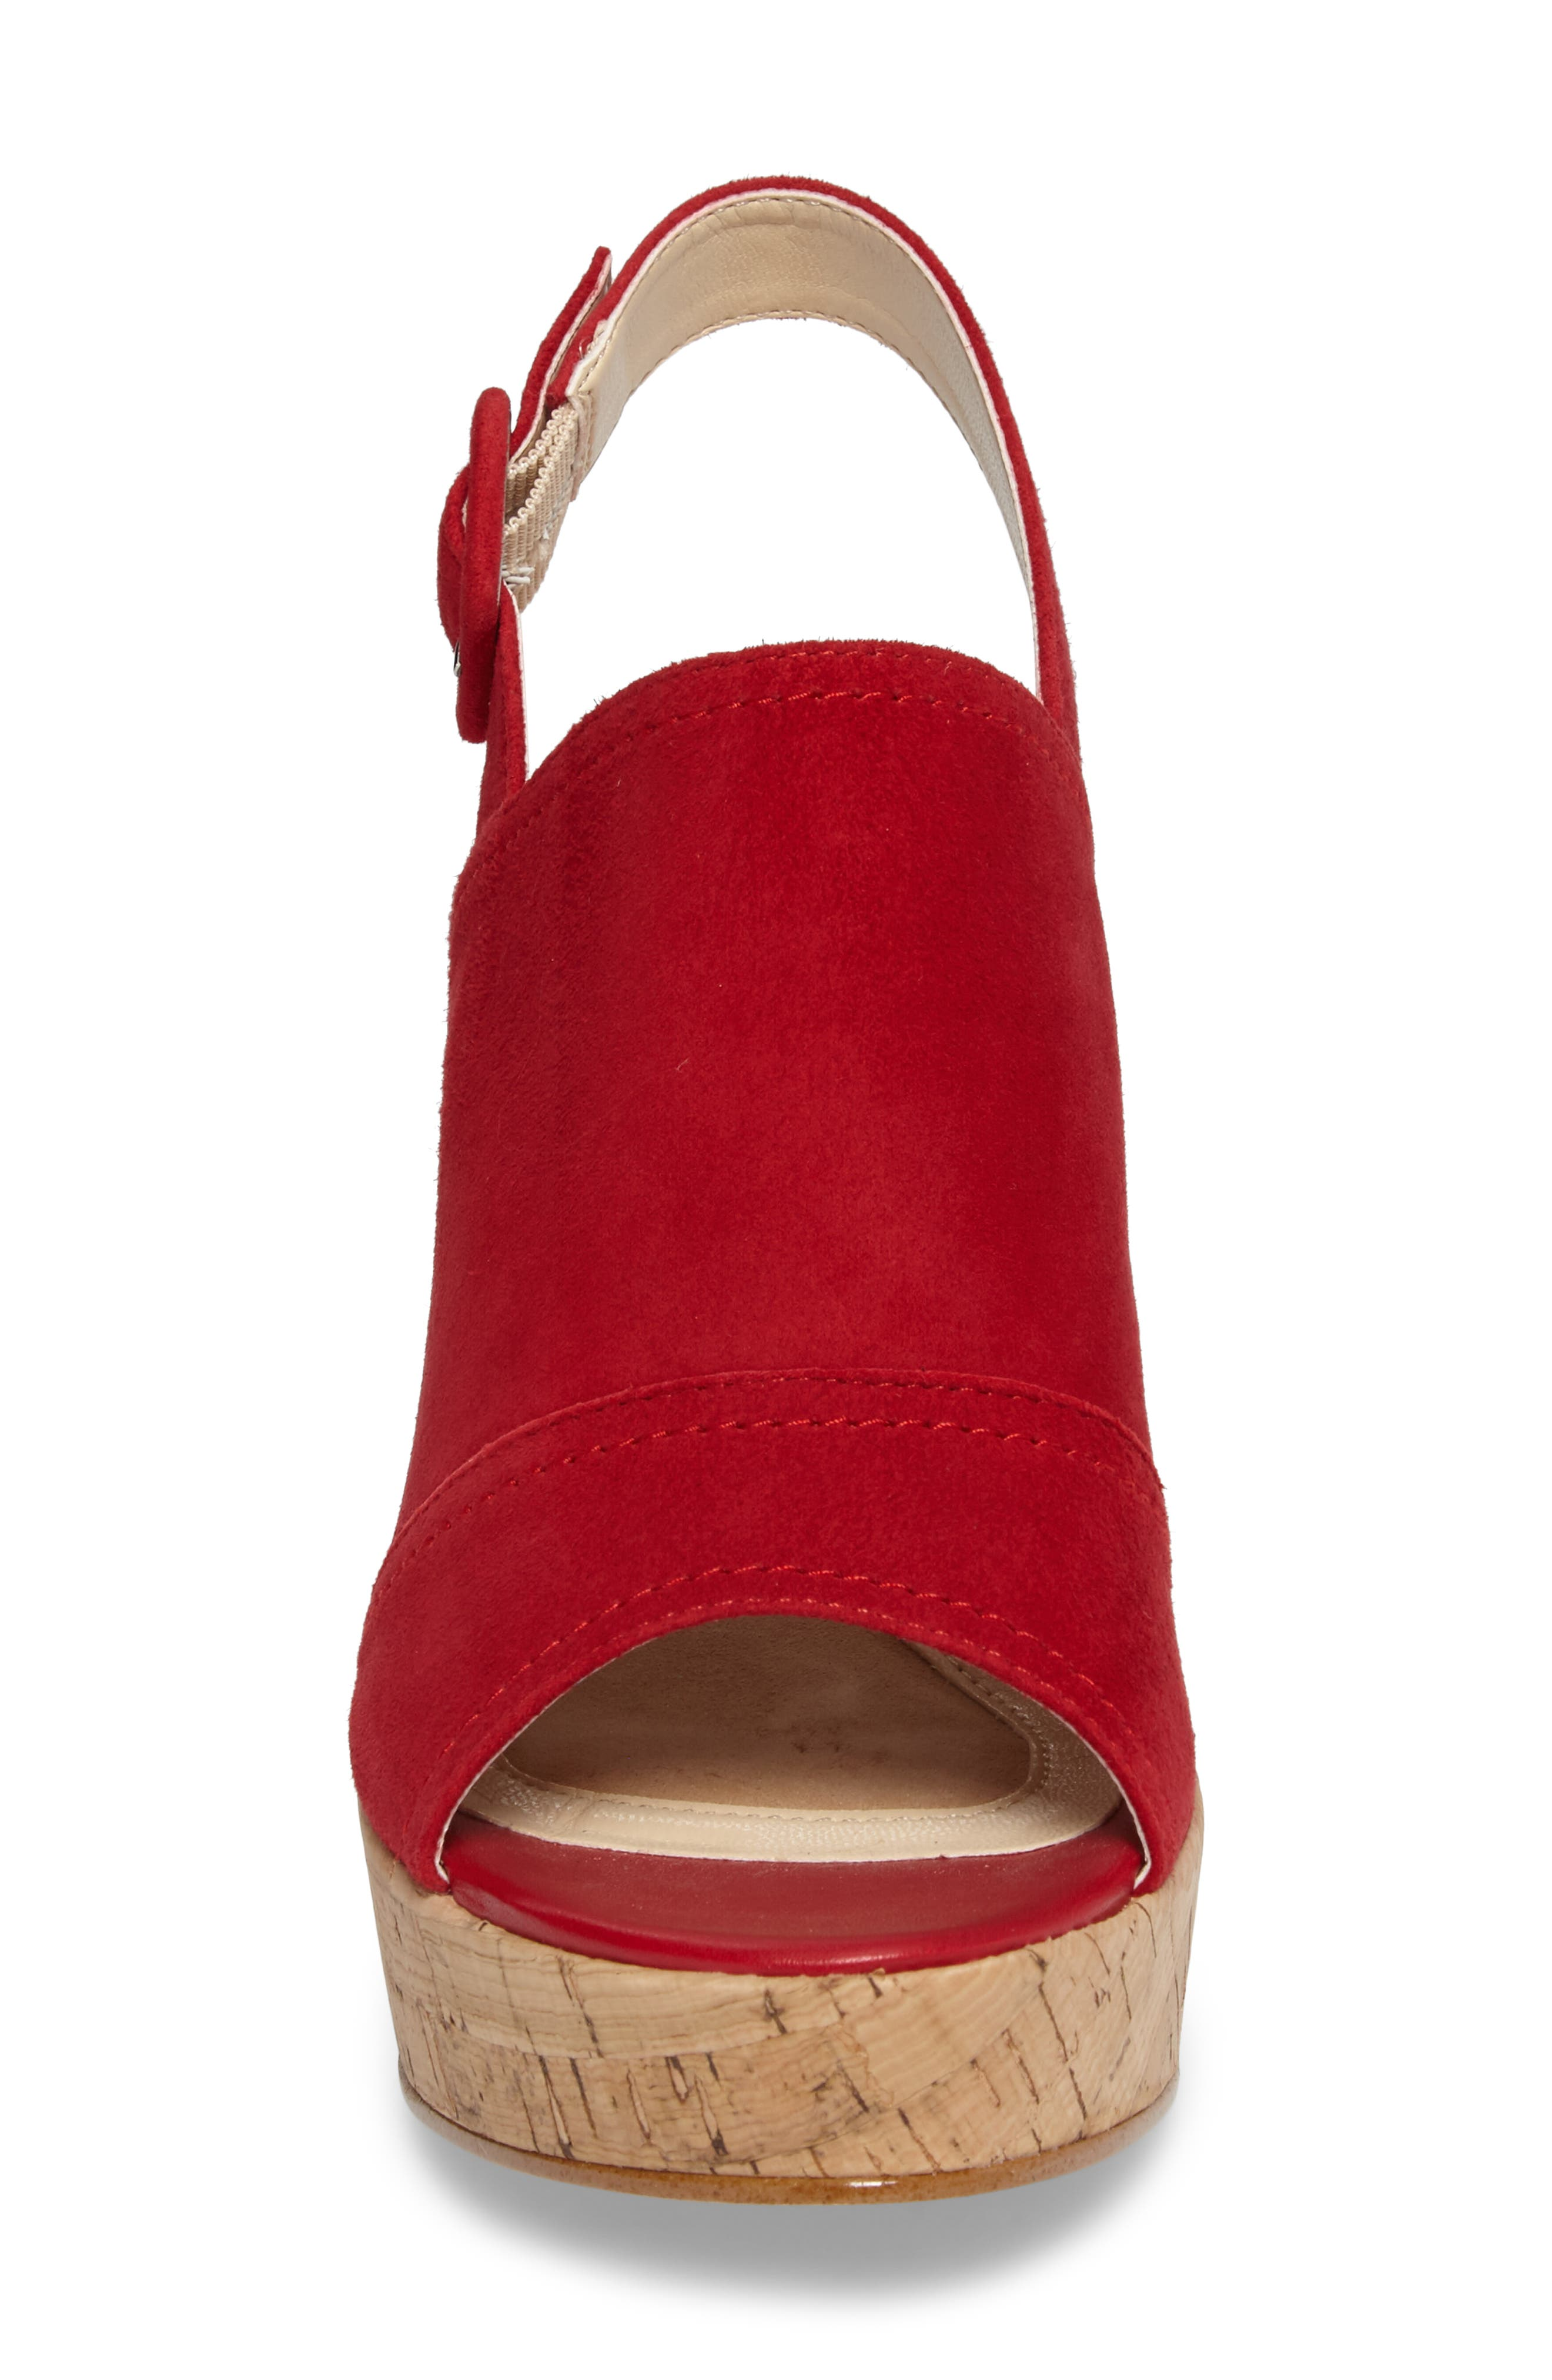 Gabriela Slingback Platform Sandal,                             Alternate thumbnail 4, color,                             Fire Red Suede